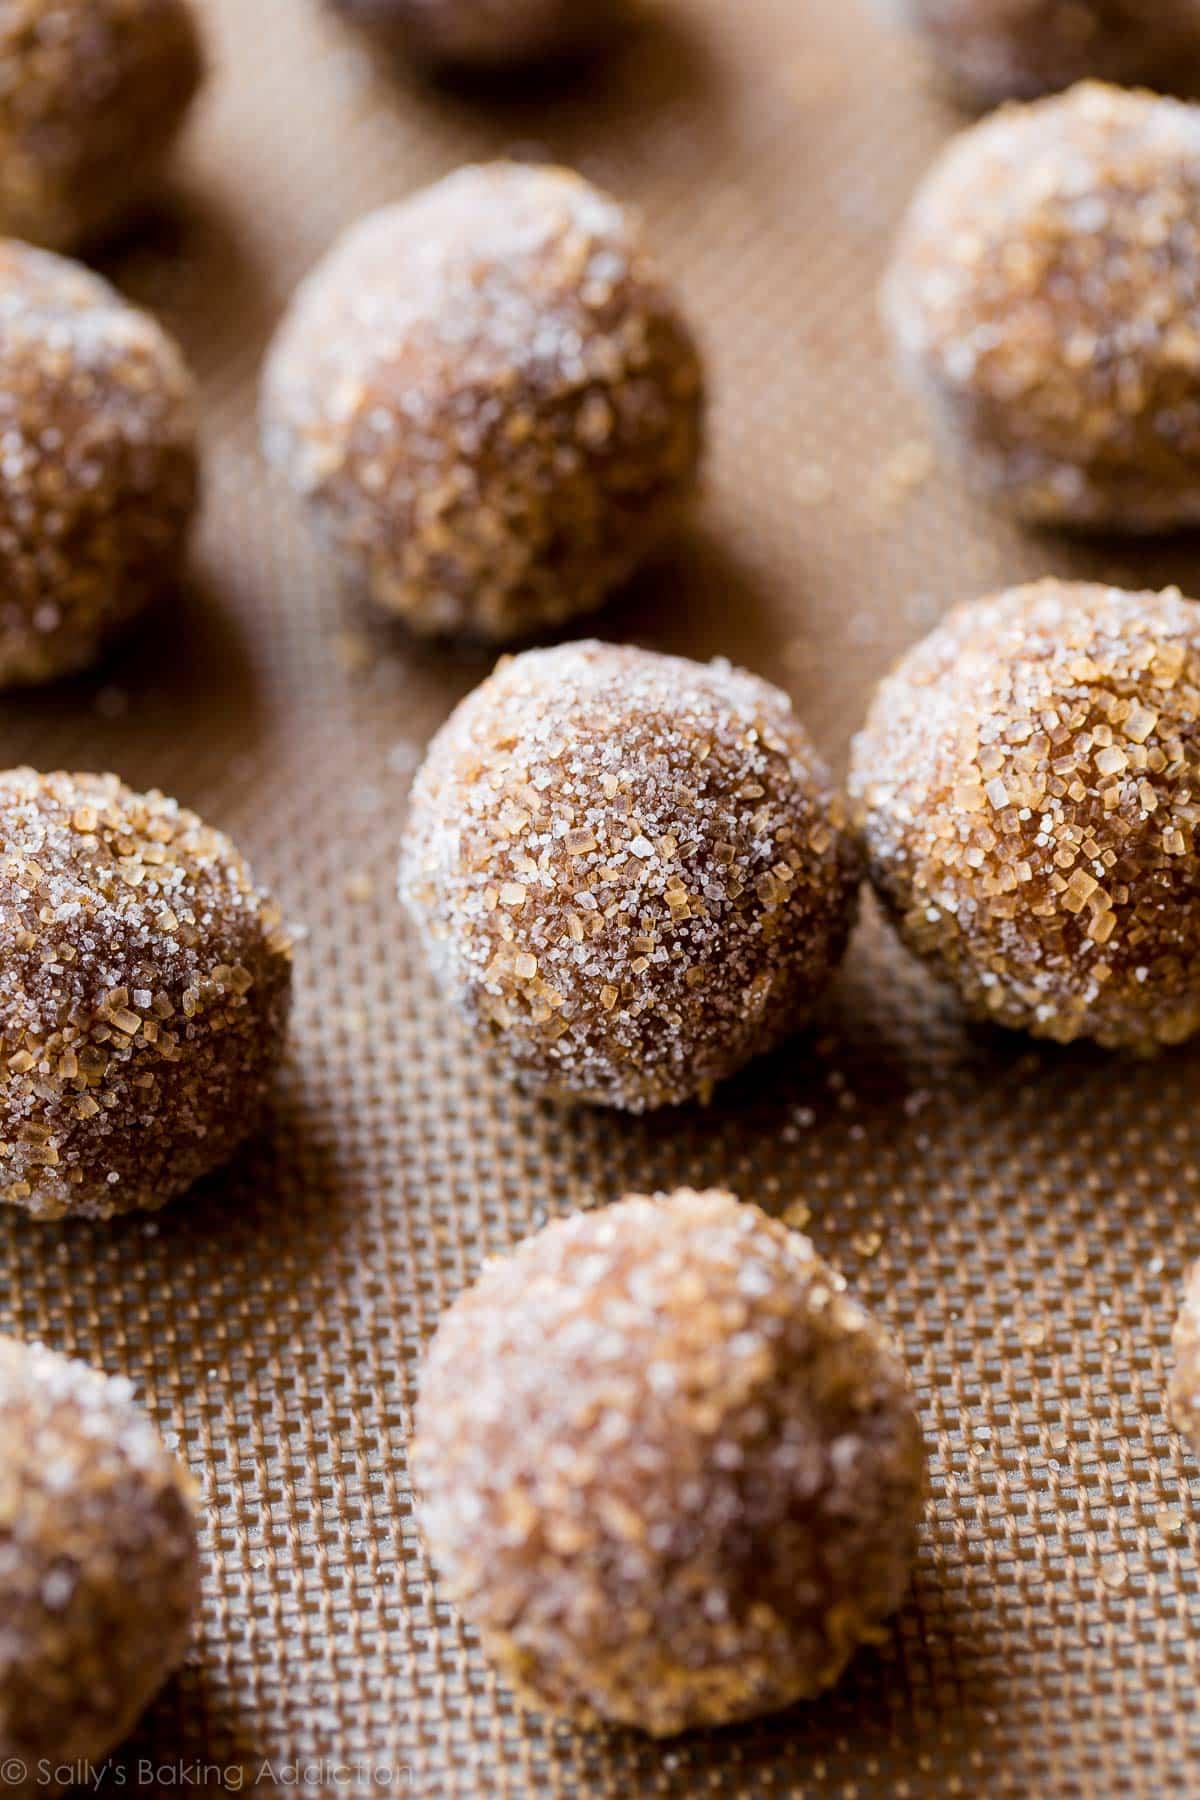 Crisp molasses cookie dough on sallysbakingaddiction.com